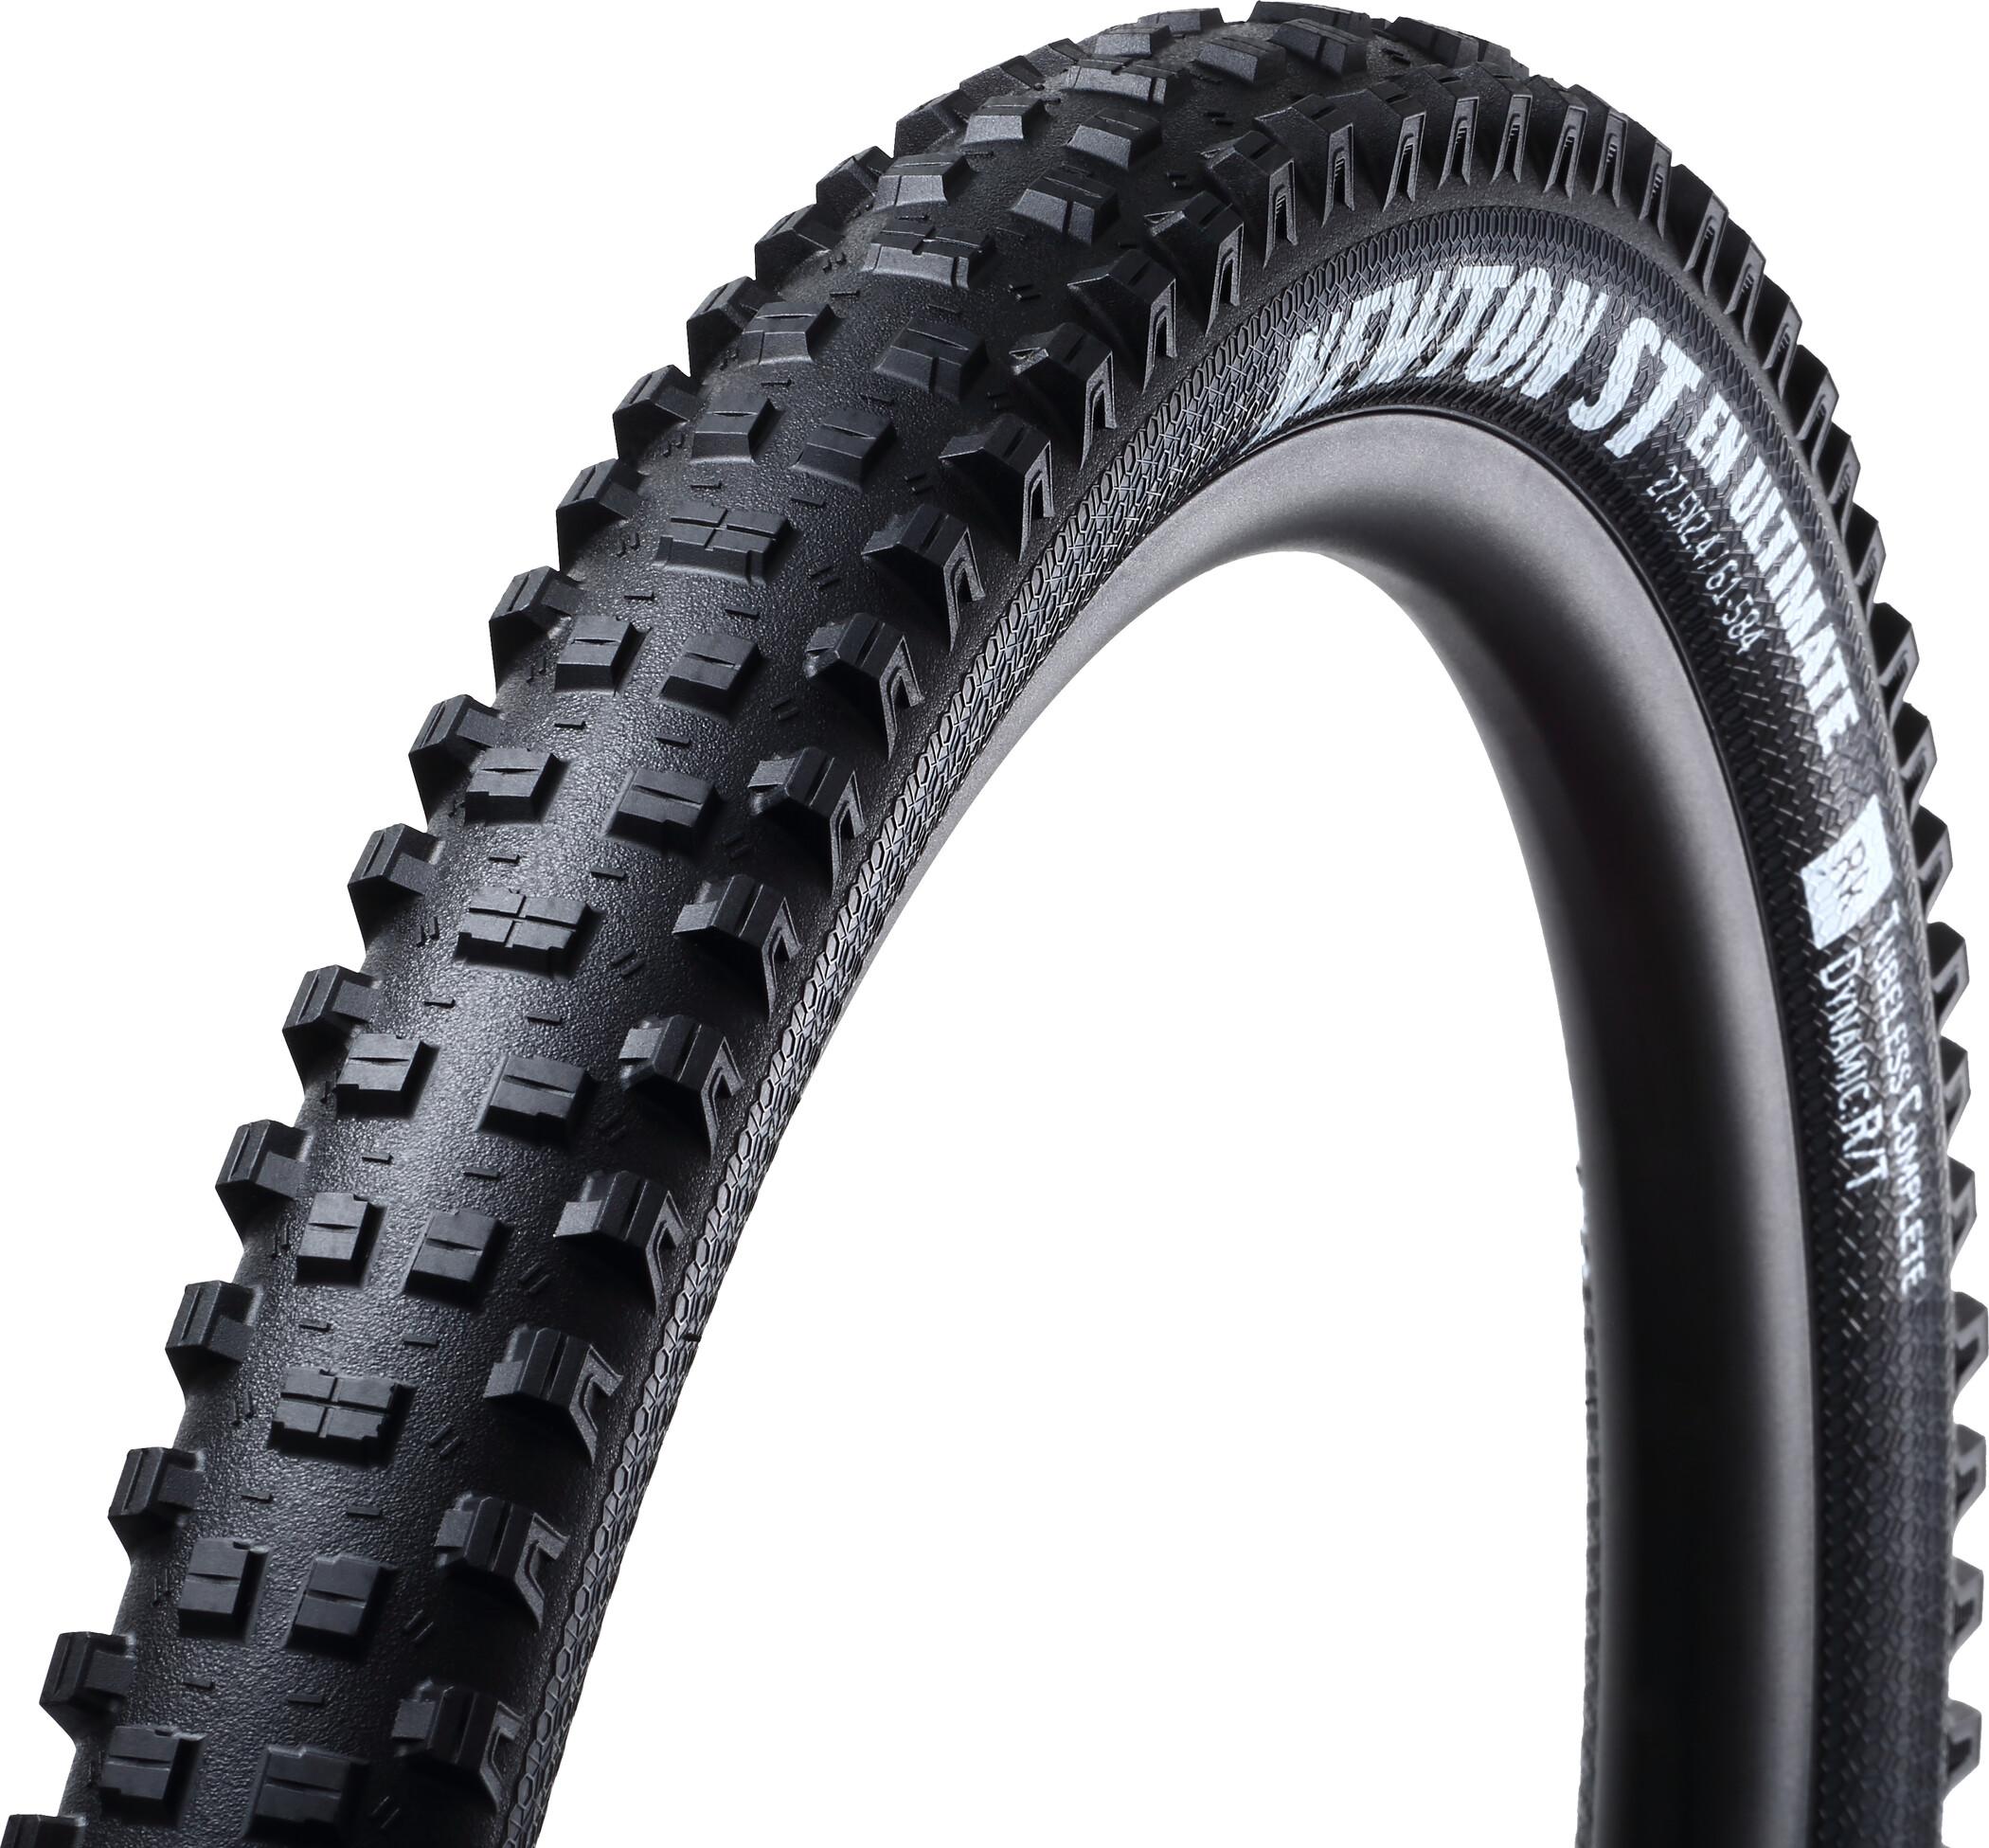 Goodyear Newton-ST EN Ultimate Foldedæk 61-622 Tubeless Complete Dynamic R/T e25, black (2019)   Tyres